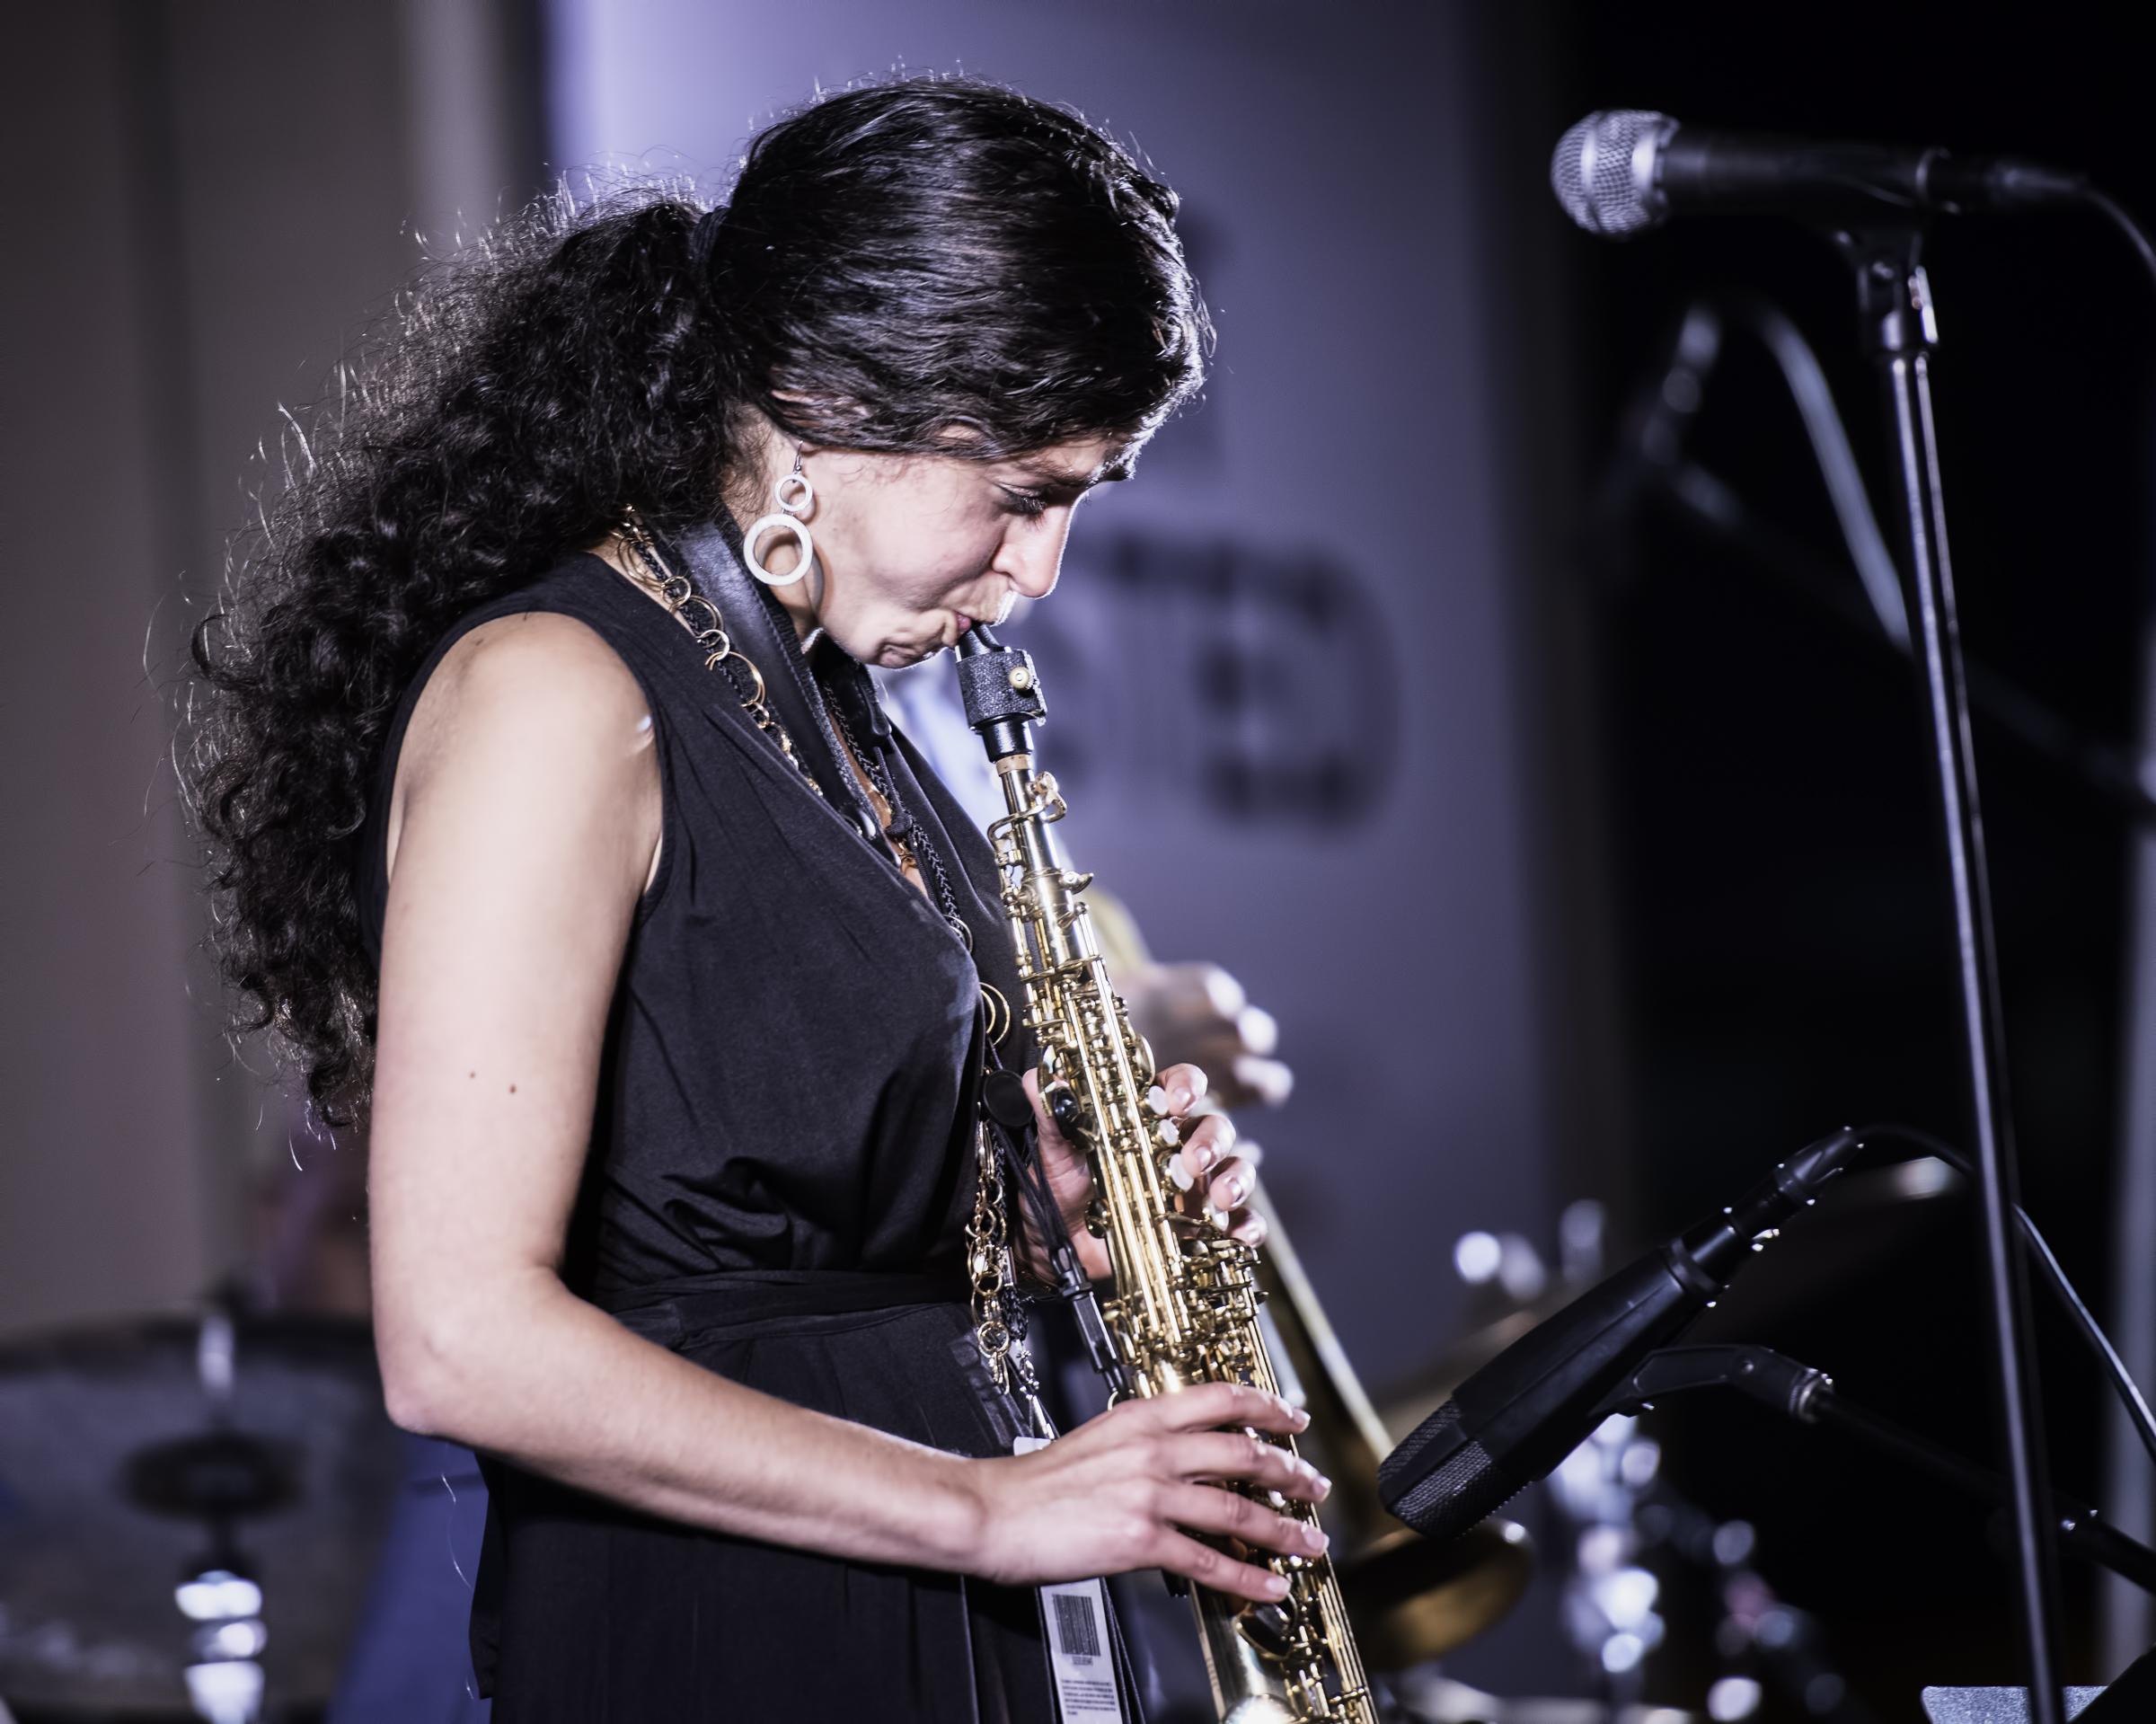 Lihi Haruvi with the Berklee Global Jazz Ambassadors at the Monterey Jazz Festival